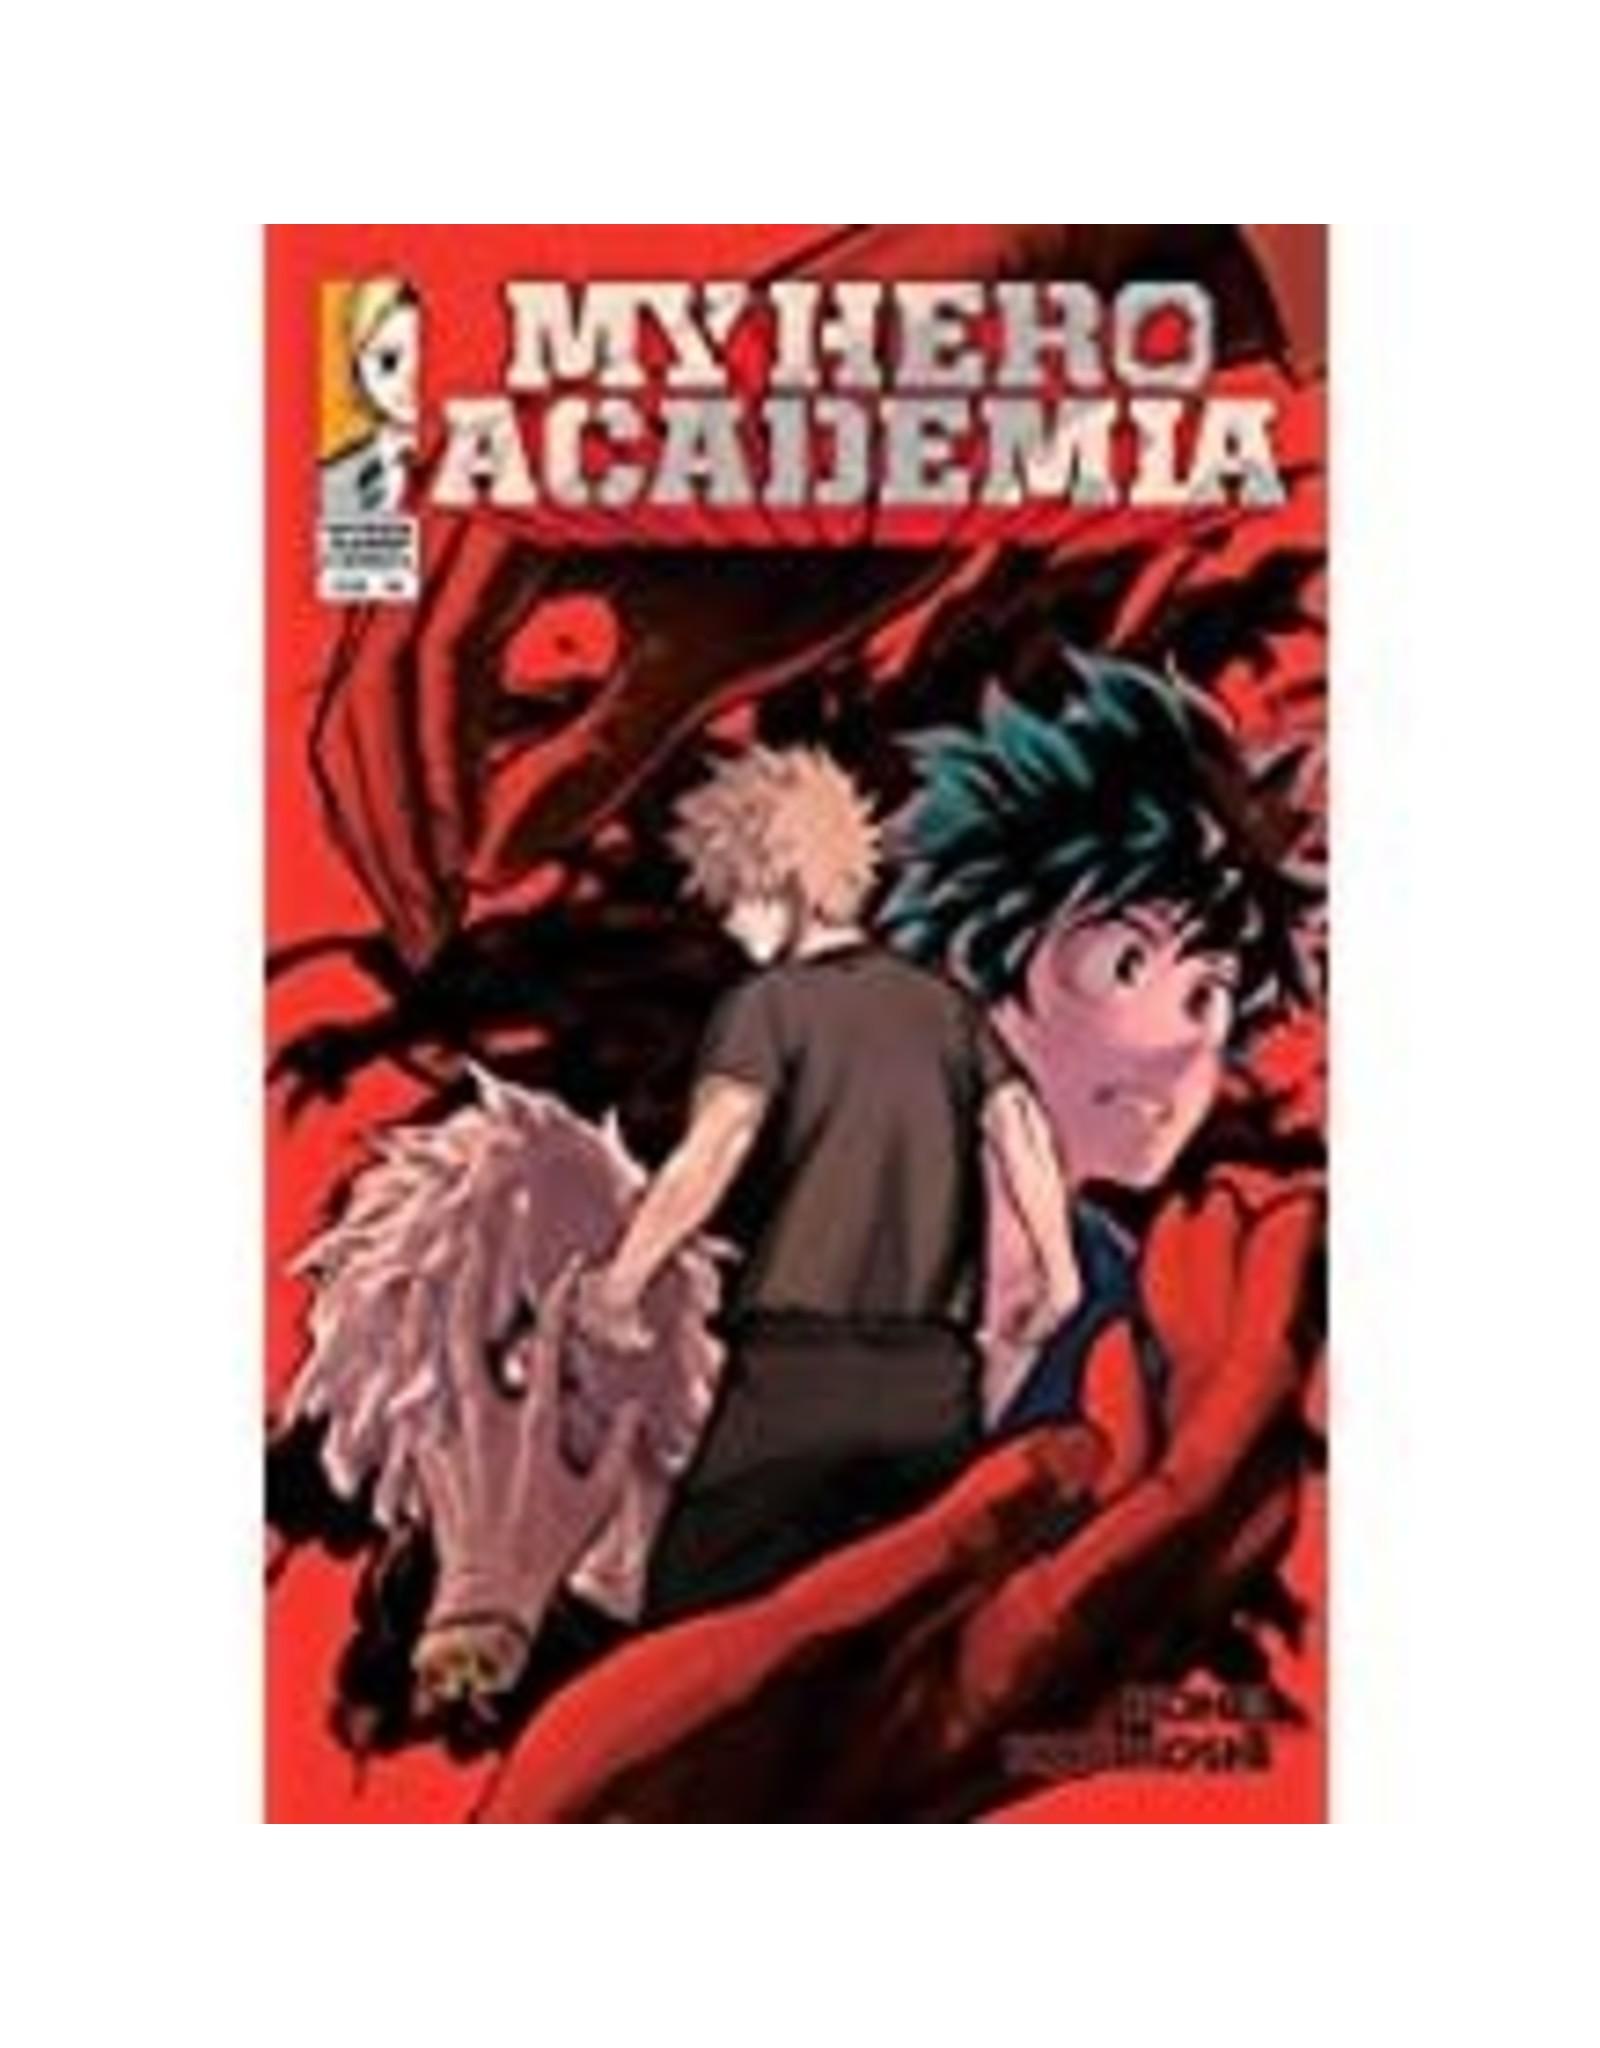 My Hero Academia Volume 10 (English Version)